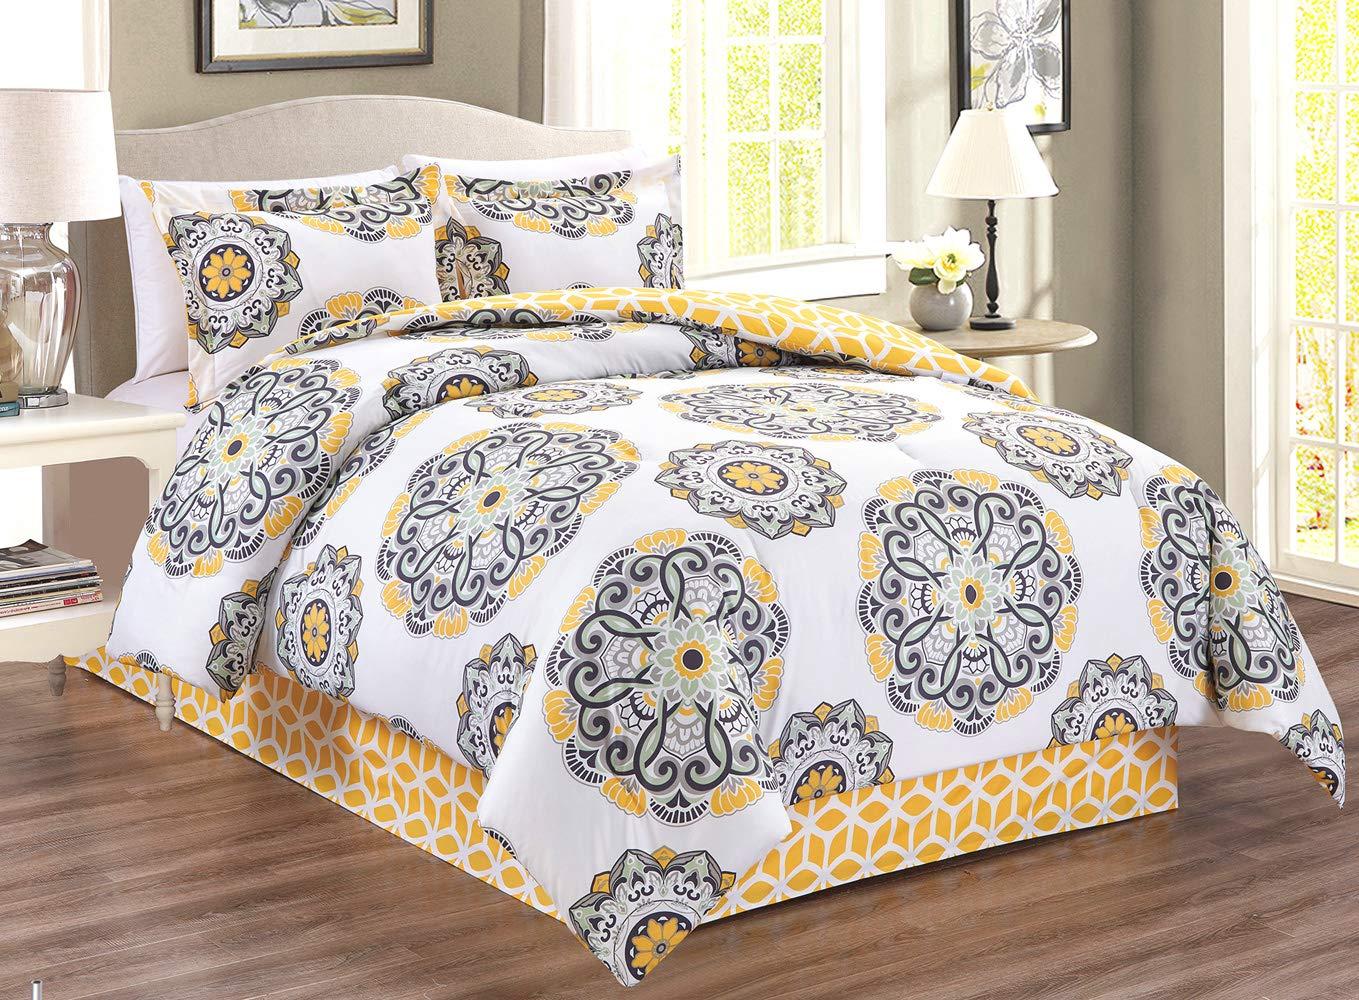 GrandLinen 4-Piece Queen Size Fine Printed Comforter Set Reversible Goose Down Alternative Bedding (Yellow, White, Black, Grey Scroll